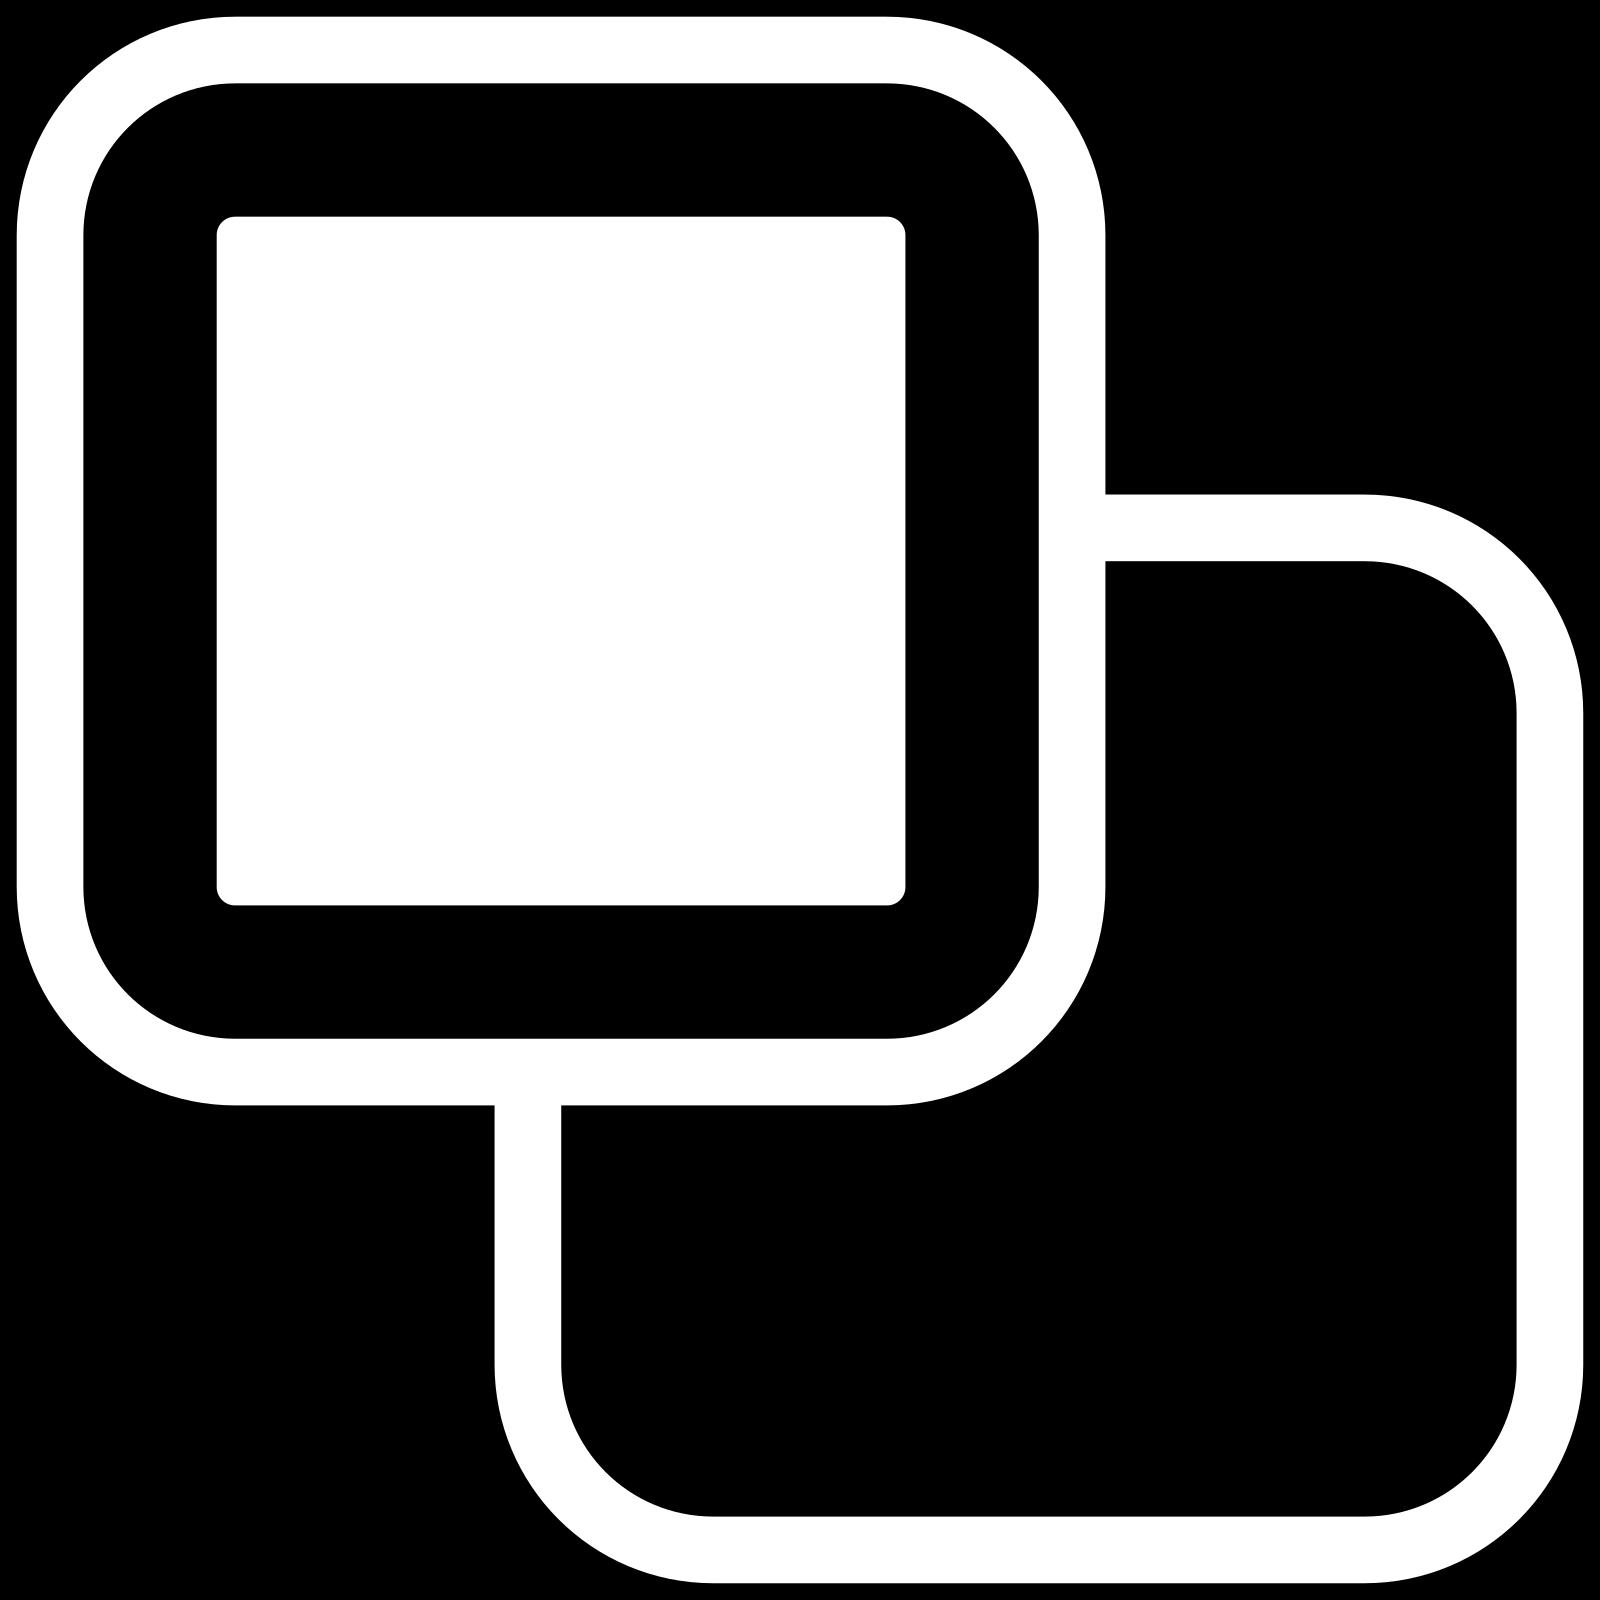 Send SVG Clip arts